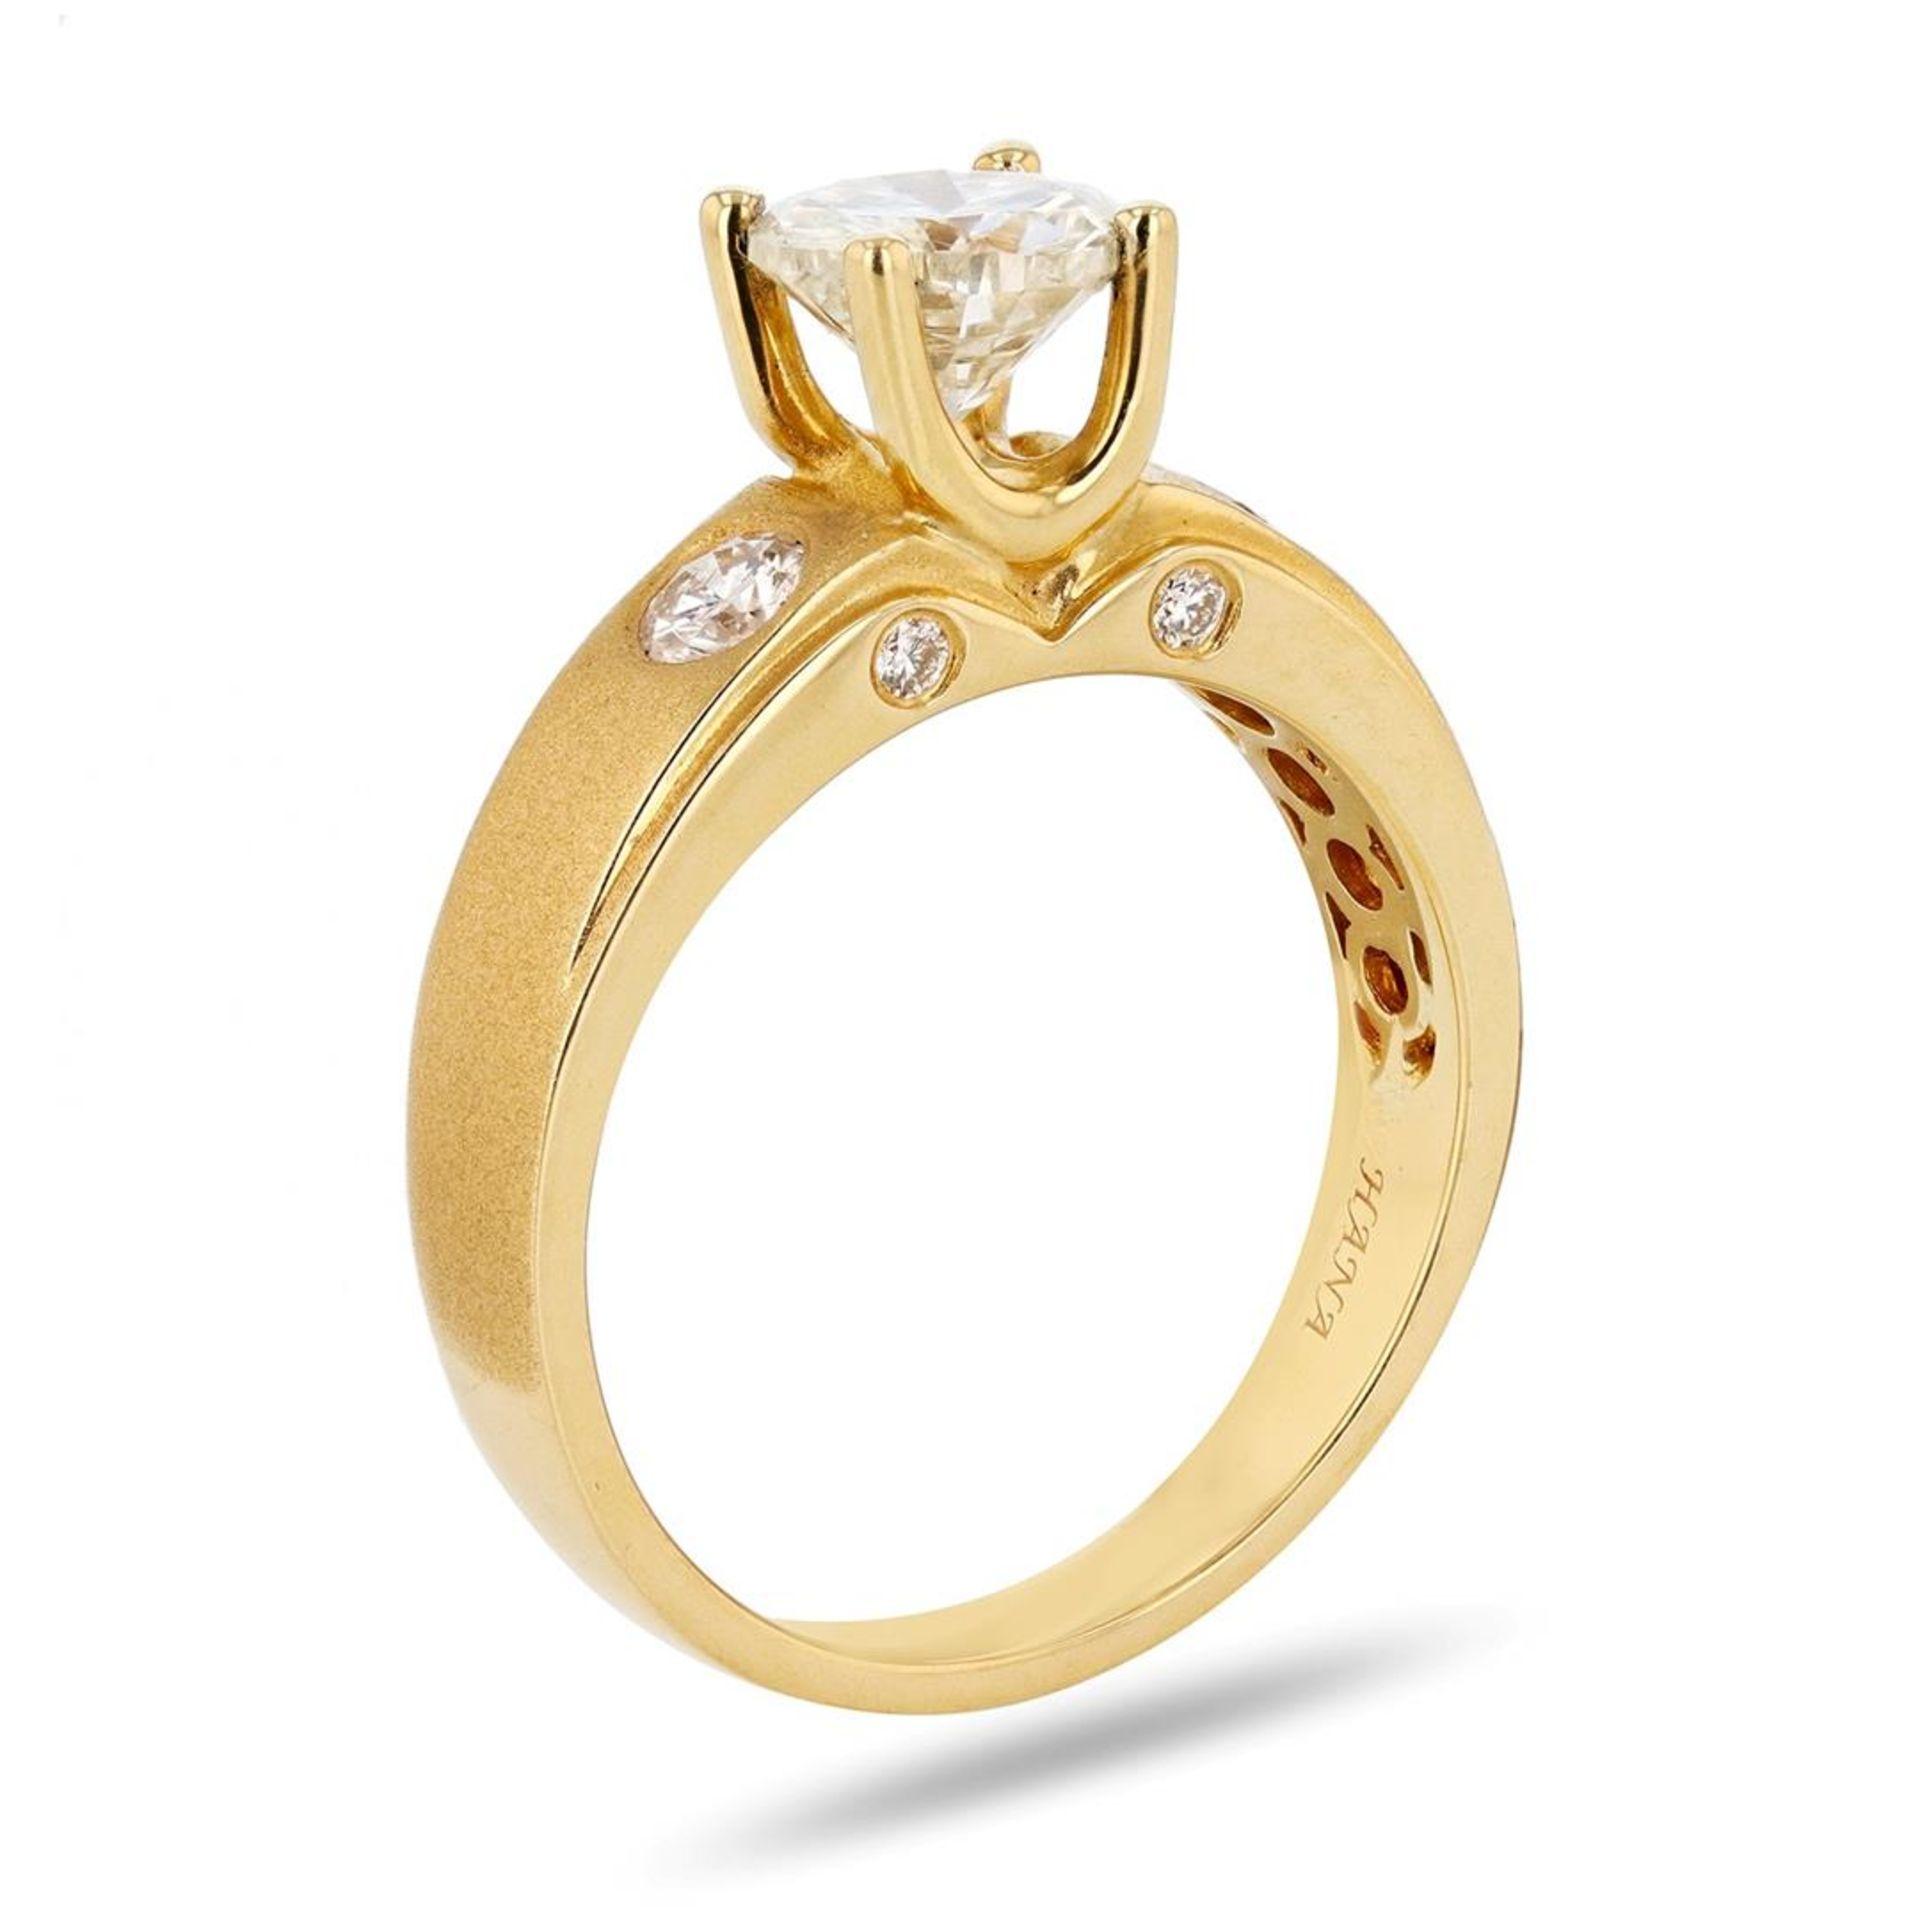 0.97ct SI2 Diamond 18K Yellow Gold Unity Ring (1.26ctw Diamonds) - Image 2 of 4